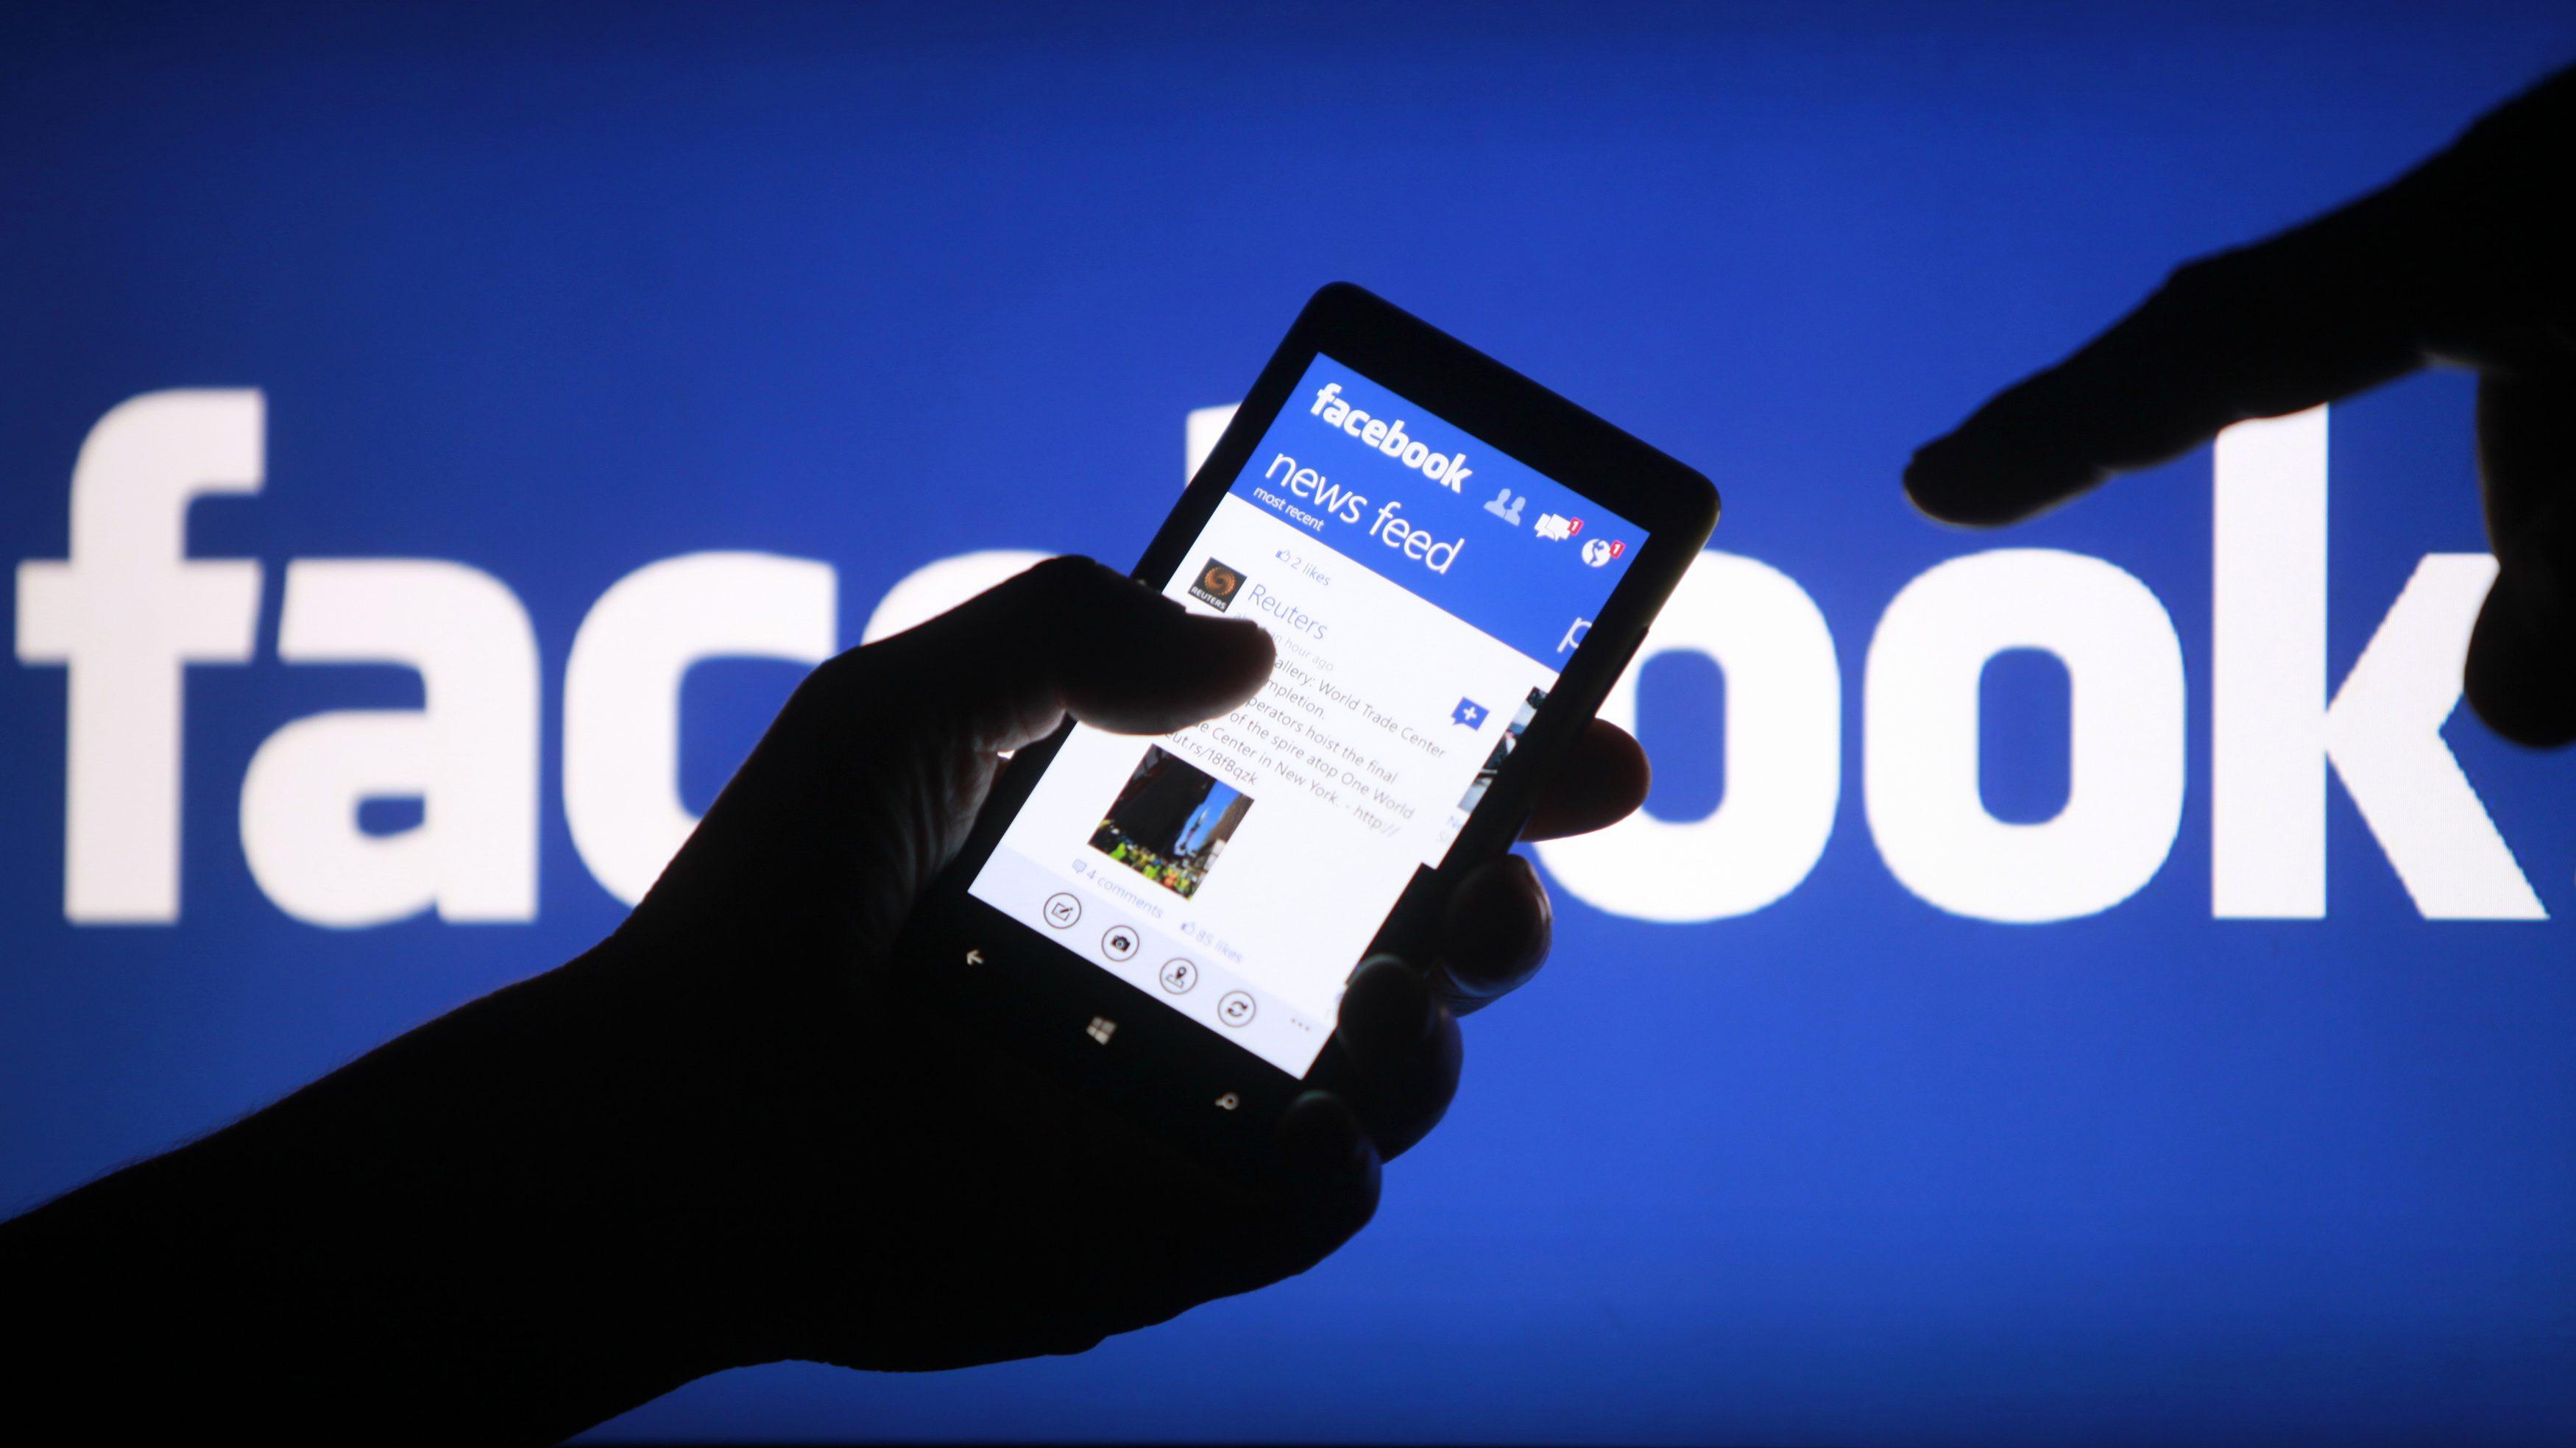 Móvil usando Facebook